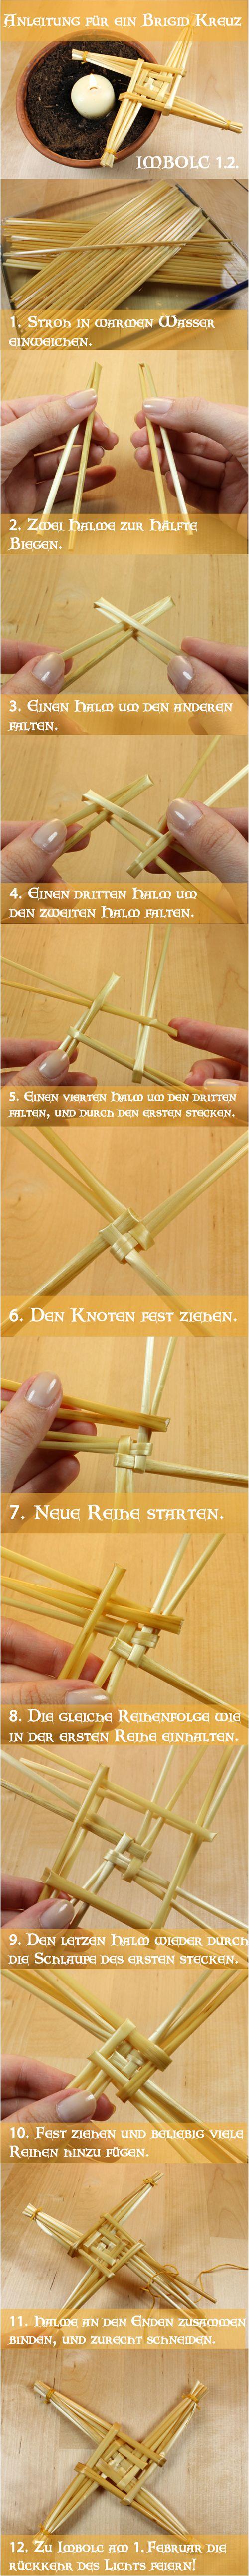 Brigid Kerze - Anleitung  Imbolc - Brigid candle DIY